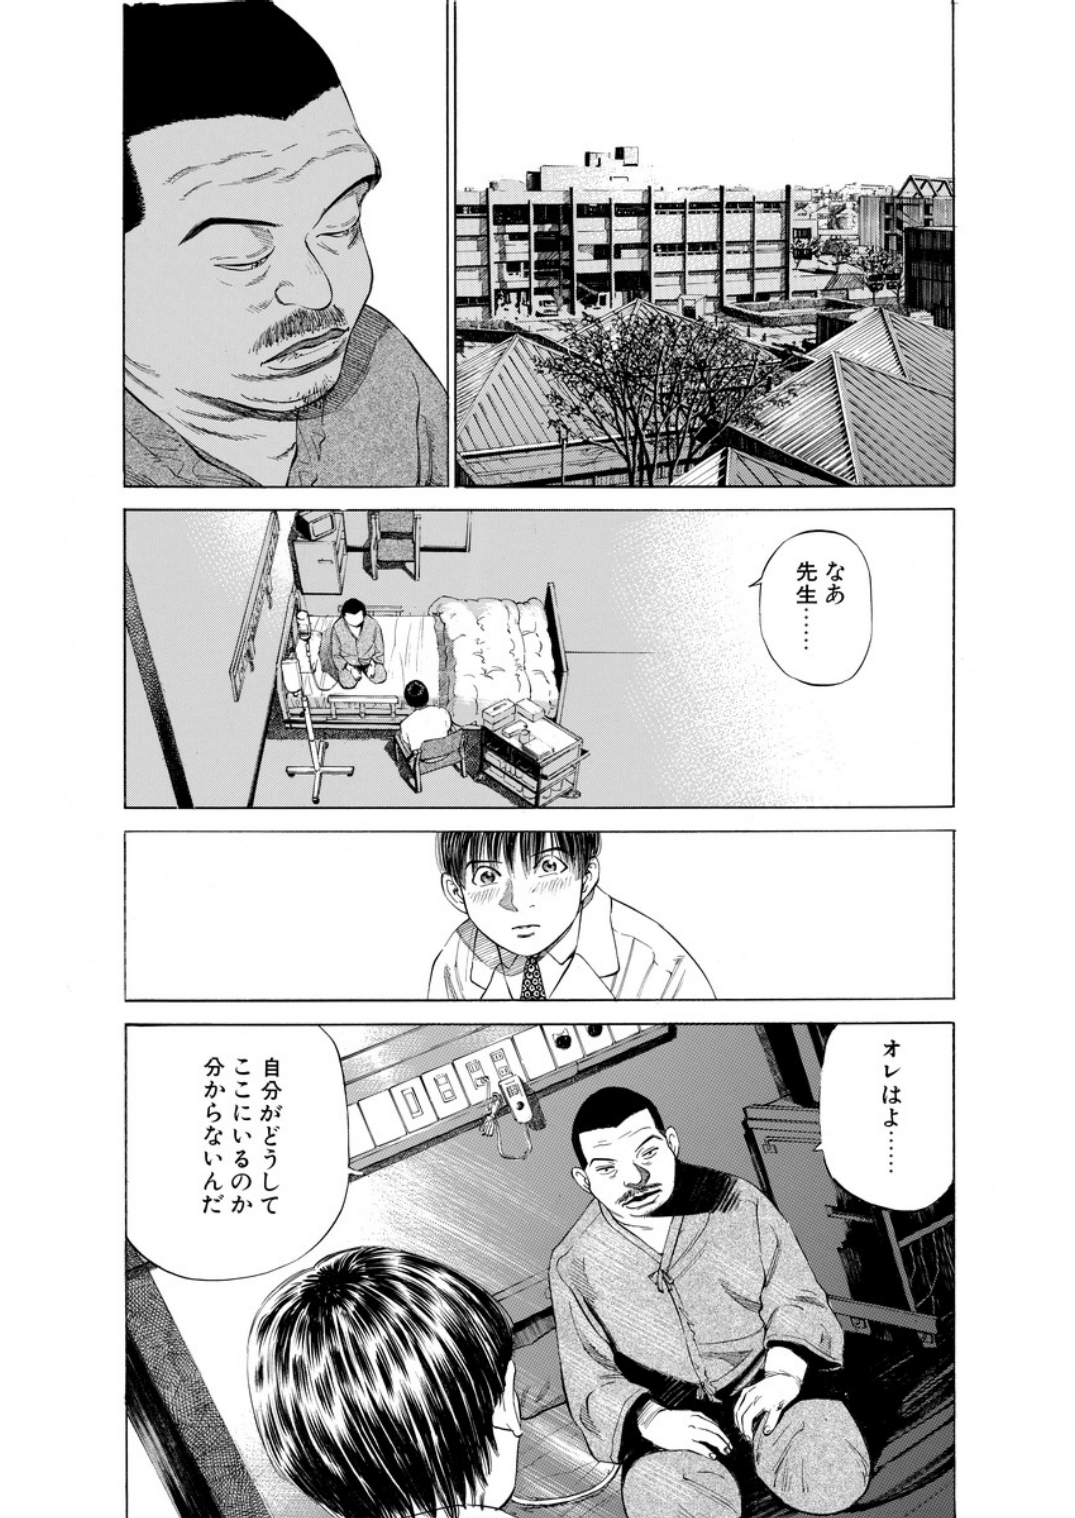 001bj_page-0183.jpg